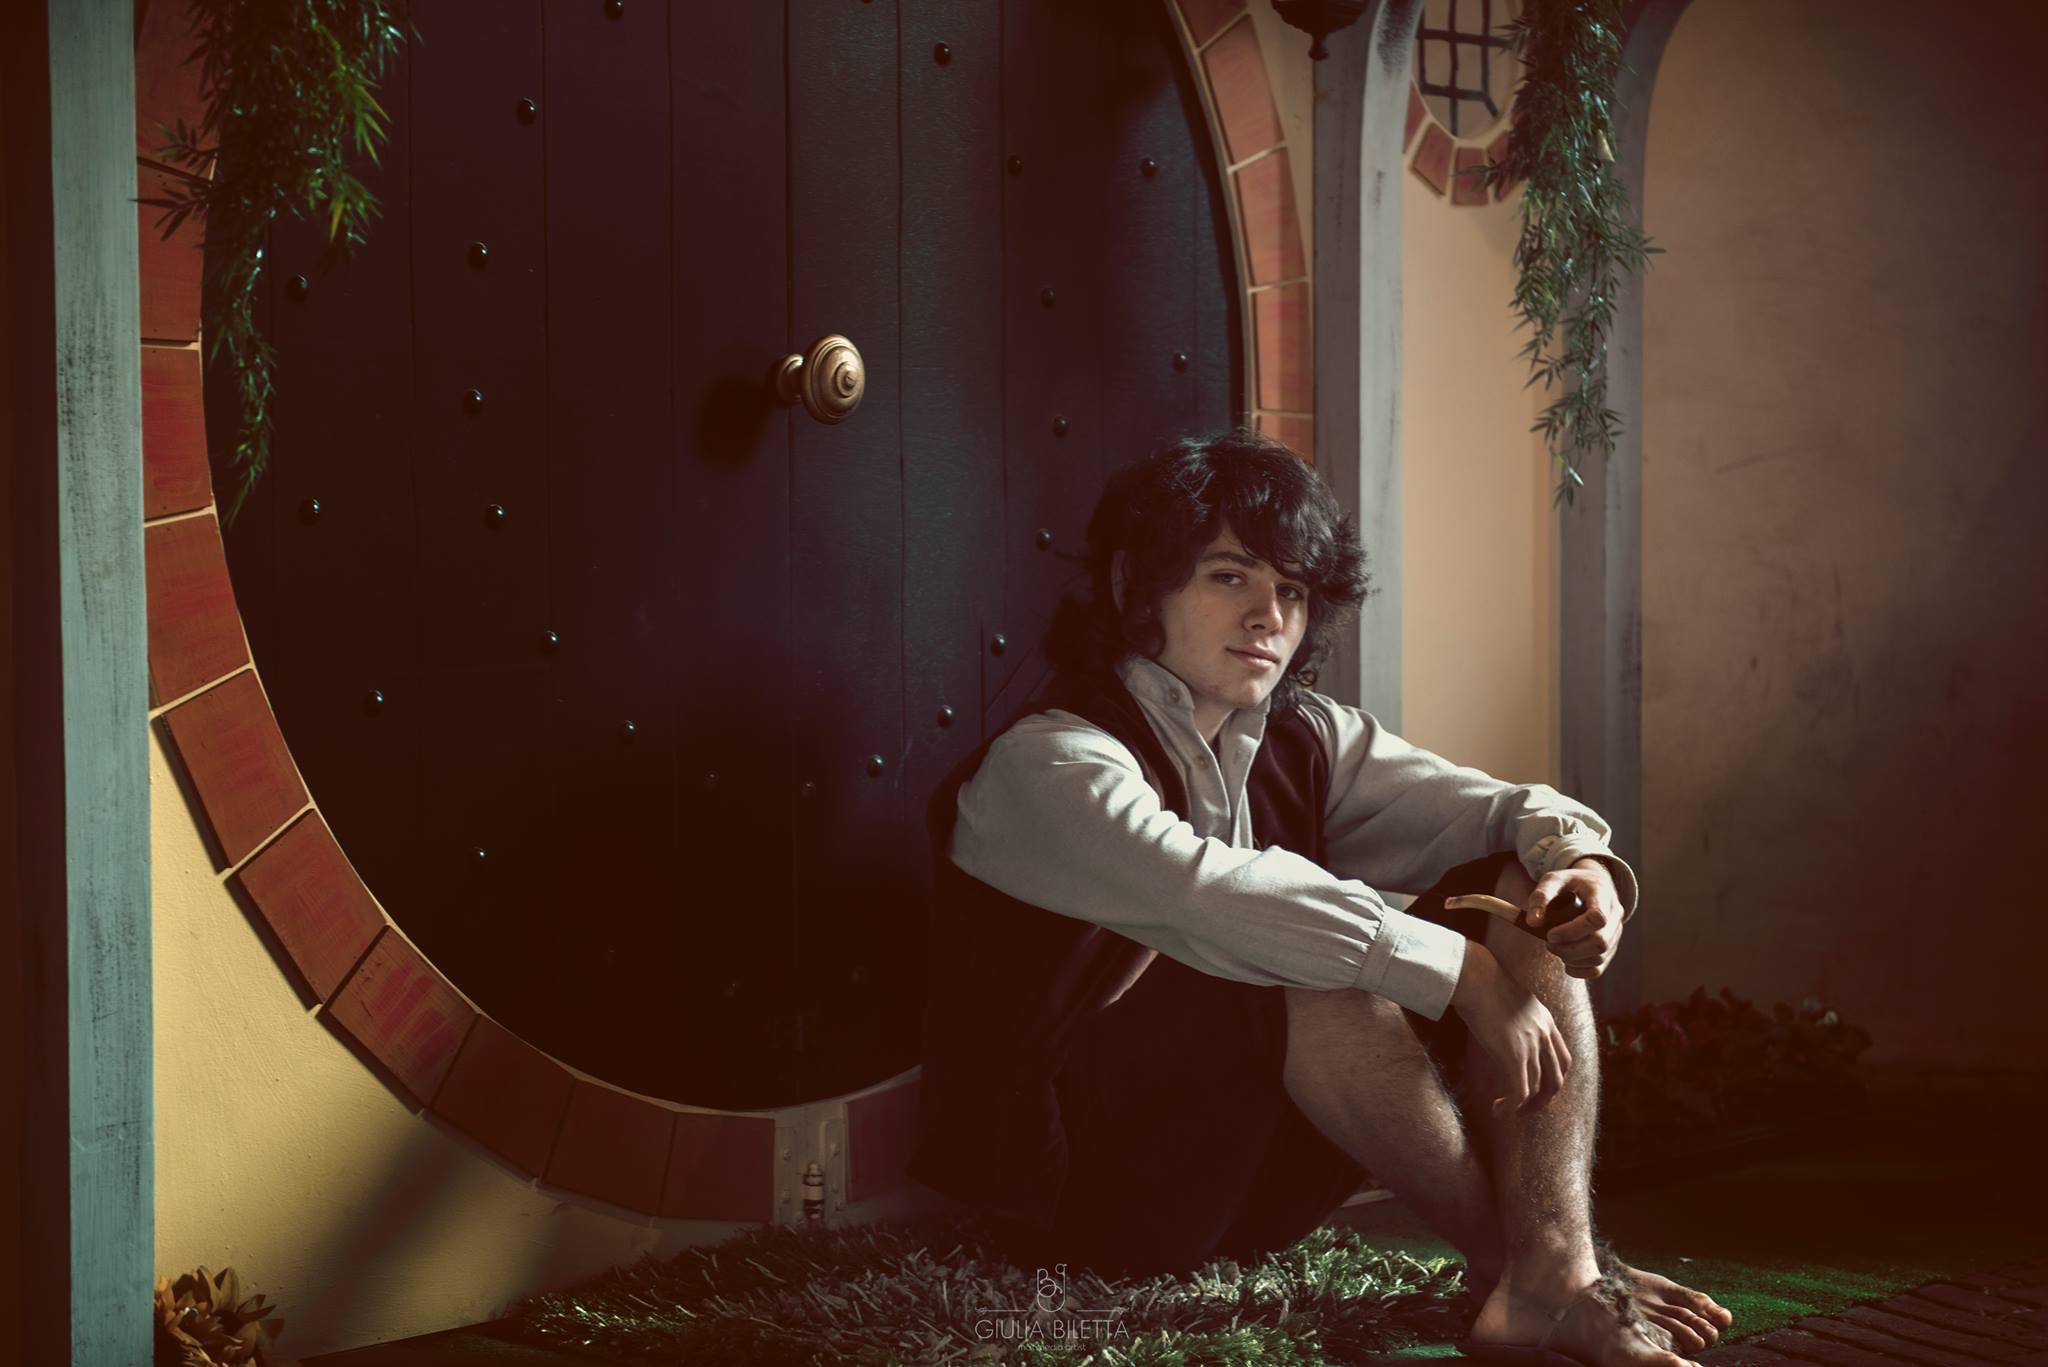 La Quarta Era - Razze - Hobbit - Frodo Baggins